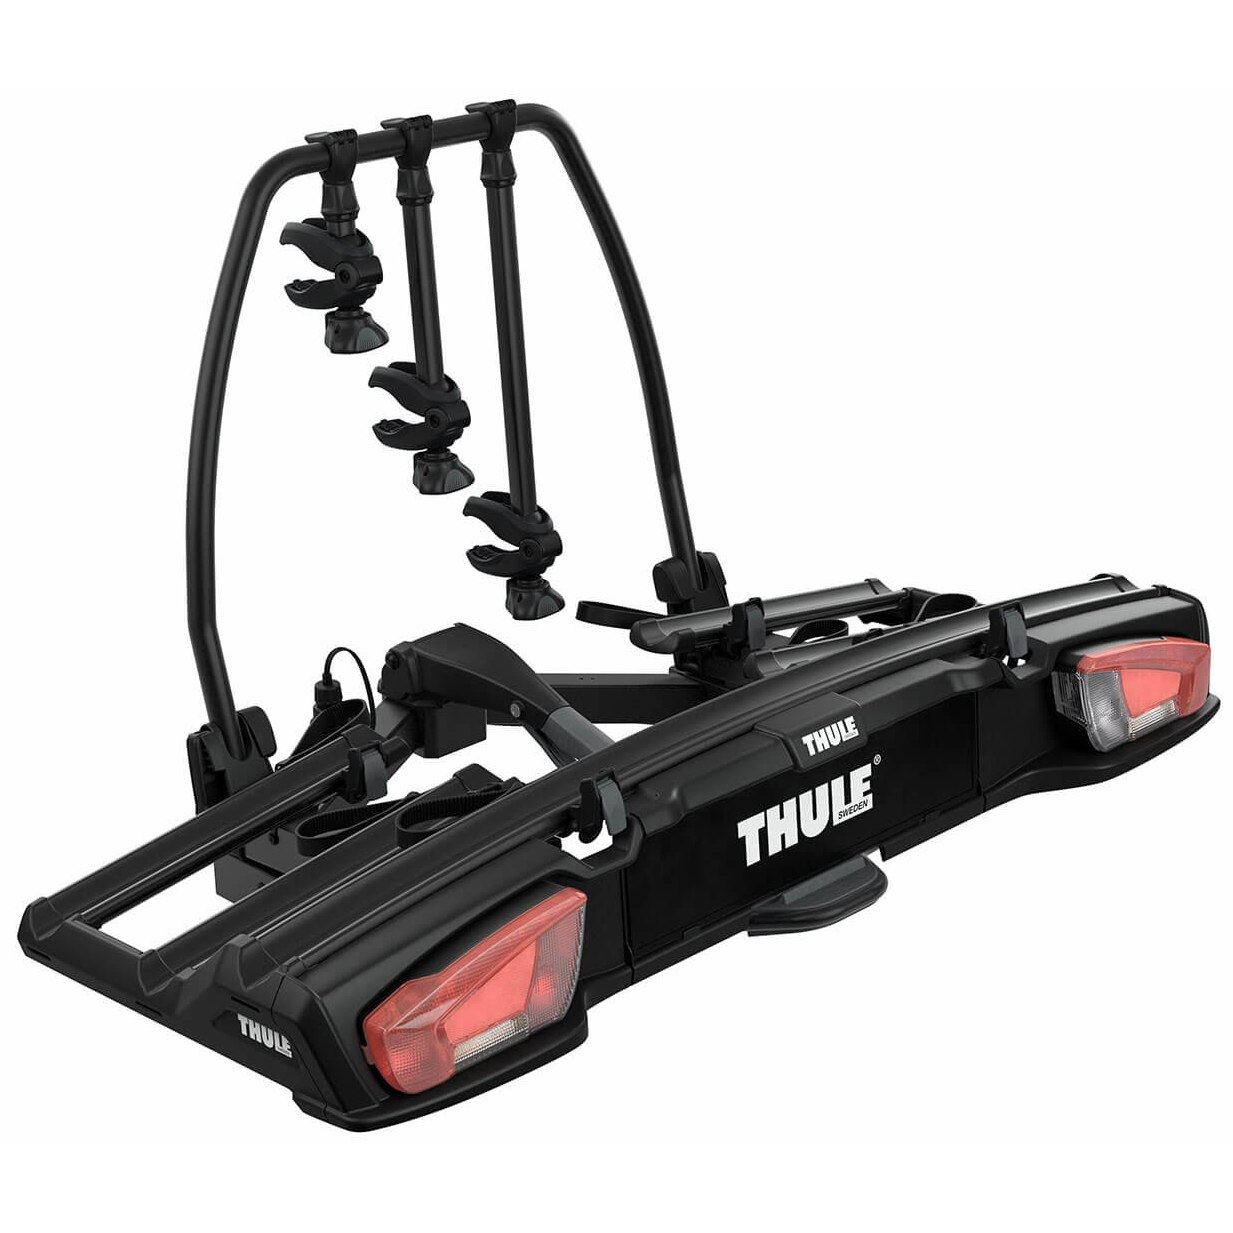 Thule VeloSpace XT 3 Bike Rack for three Bikes - Black